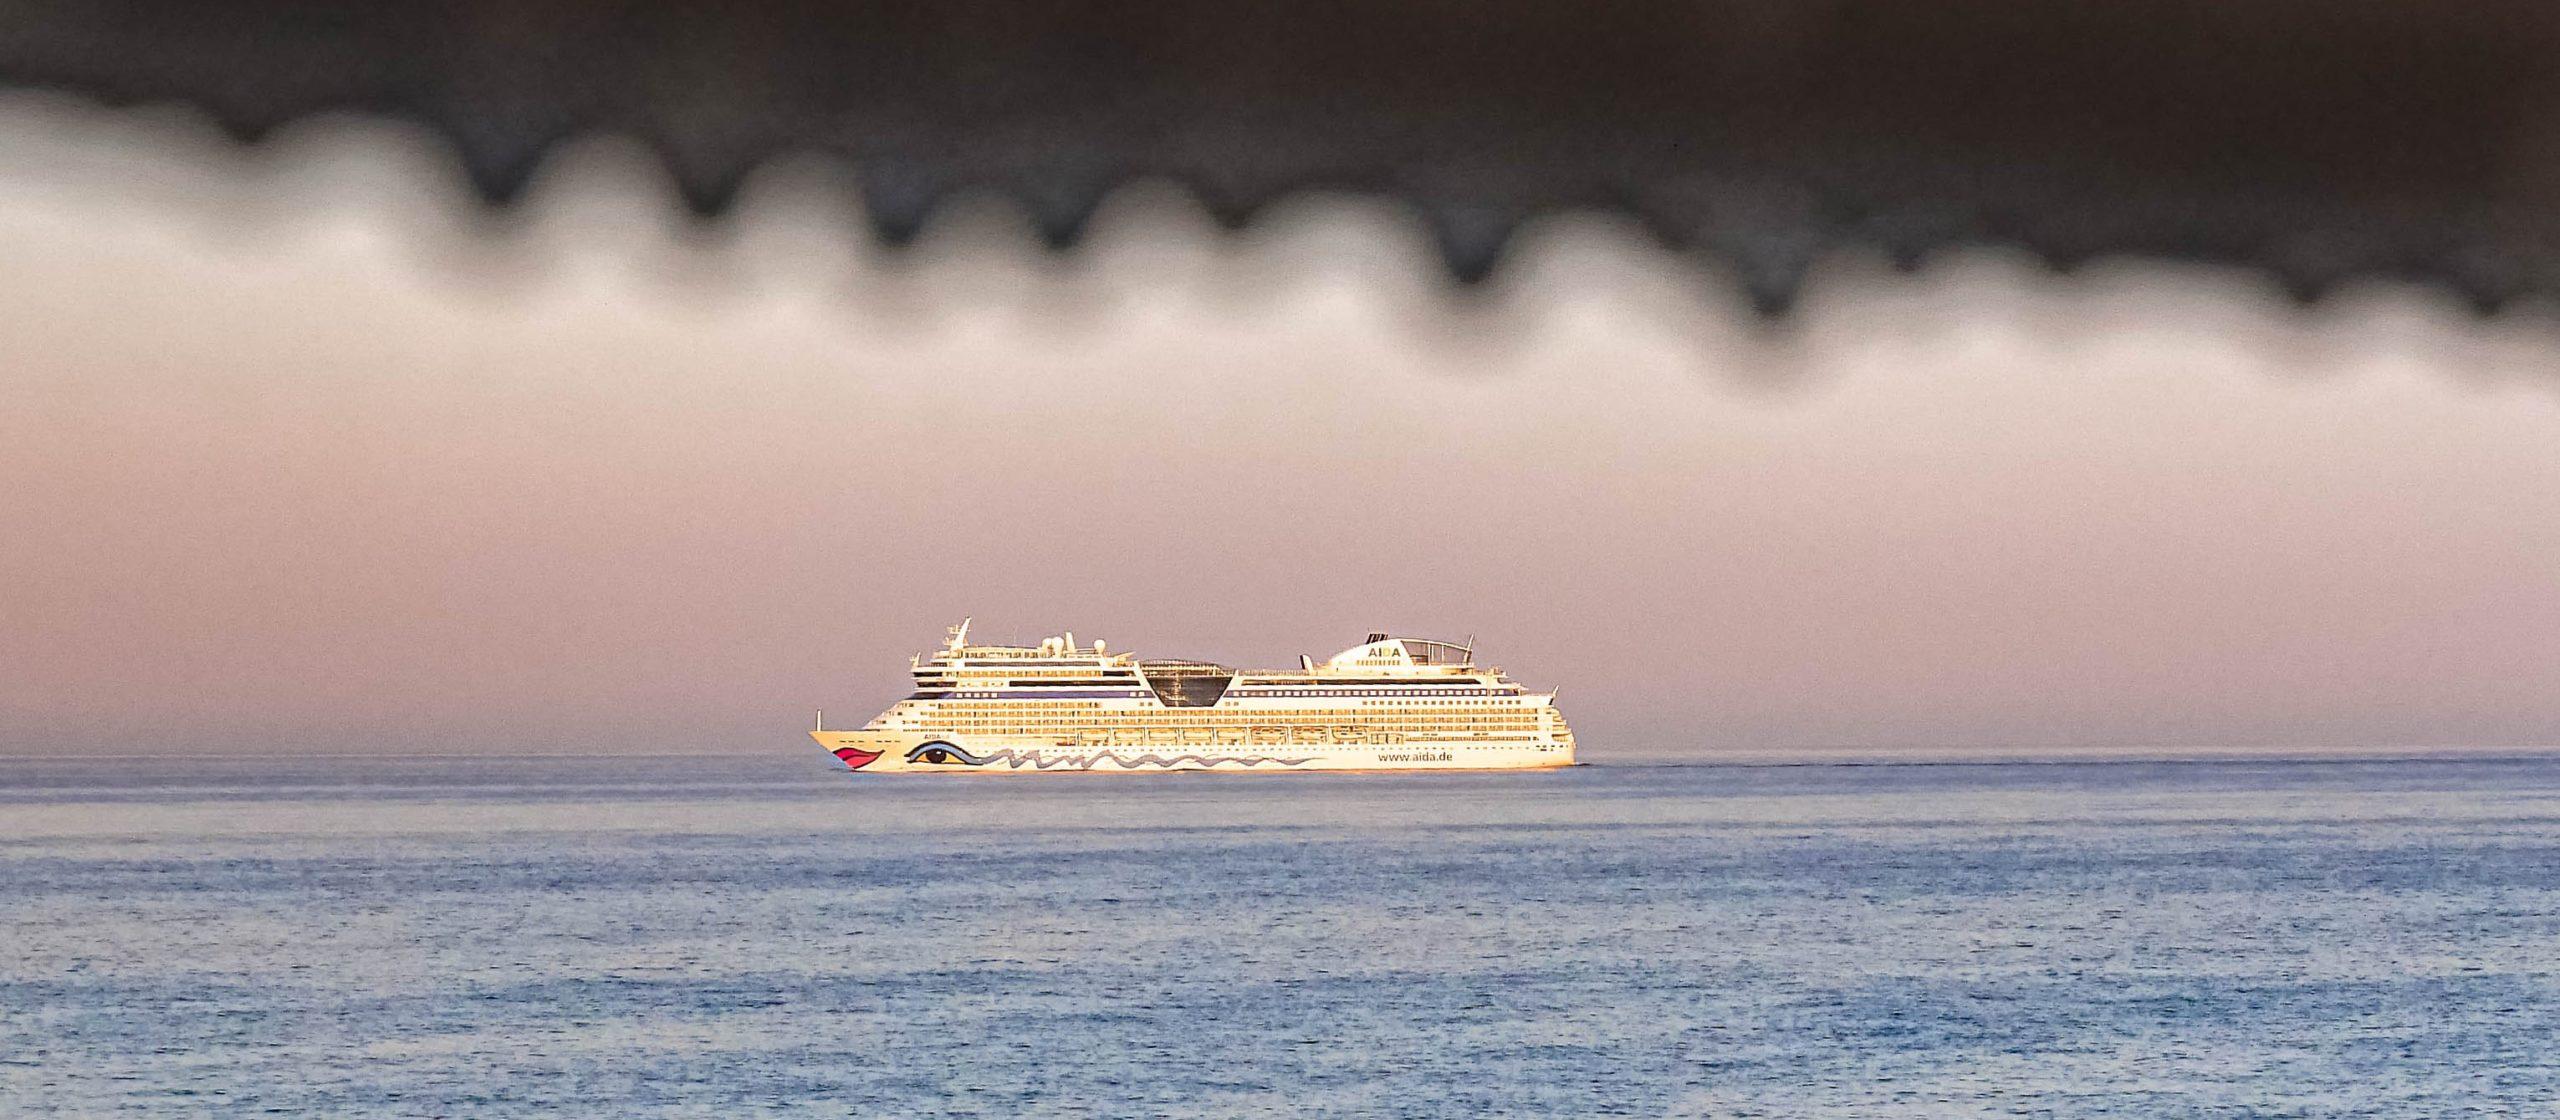 Kreuzfahrt Webcams – Kreuzfahrtschiffe zuhause entdecken!